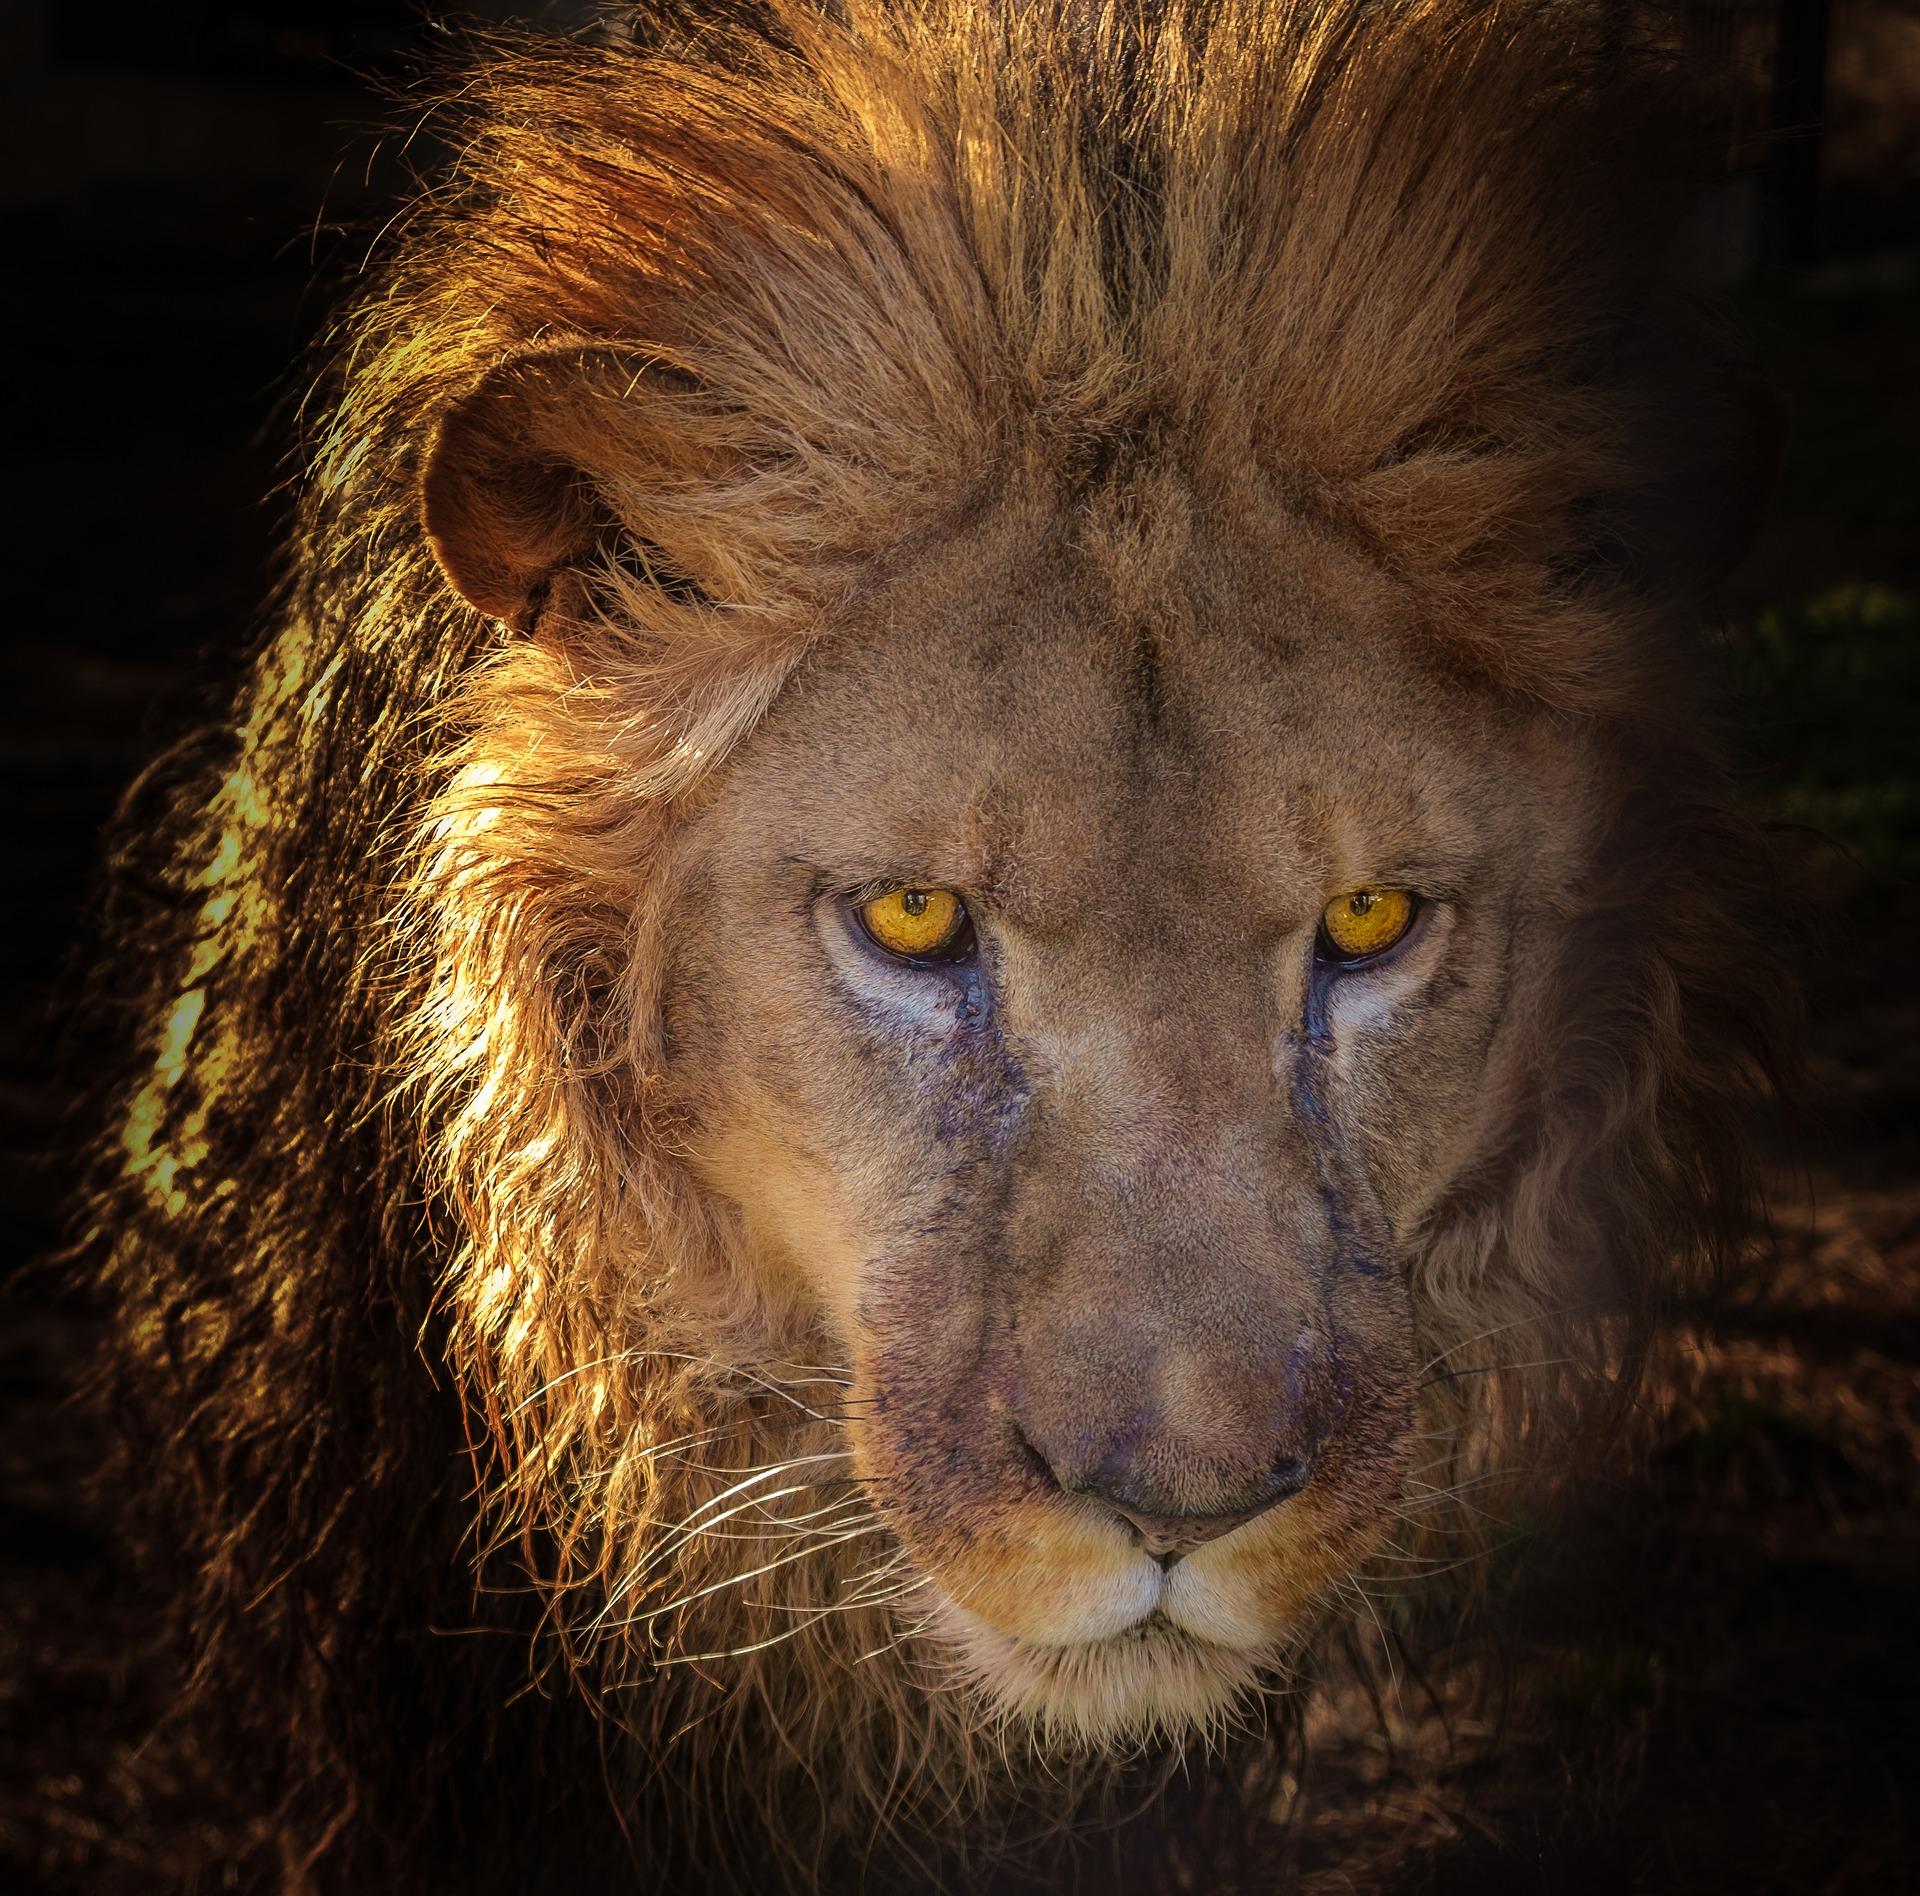 lion-3070285_1920.jpg